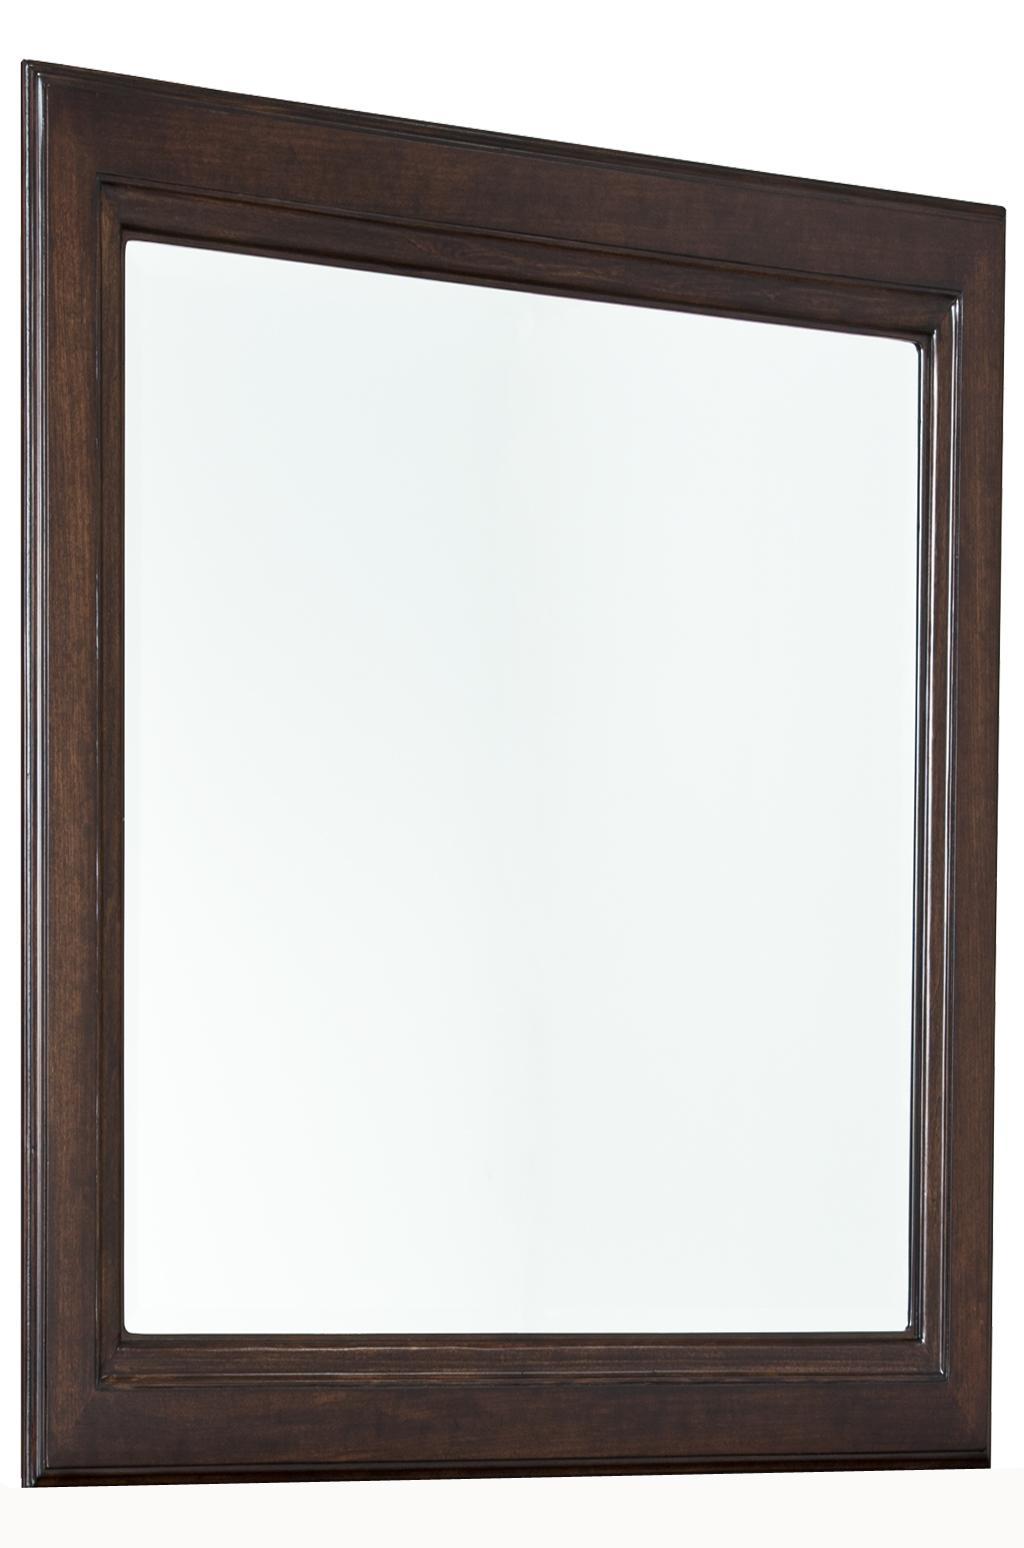 Legacy Classic Kids Benchmark Dresser / Bureau Mirror - Item Number: 2970-0100